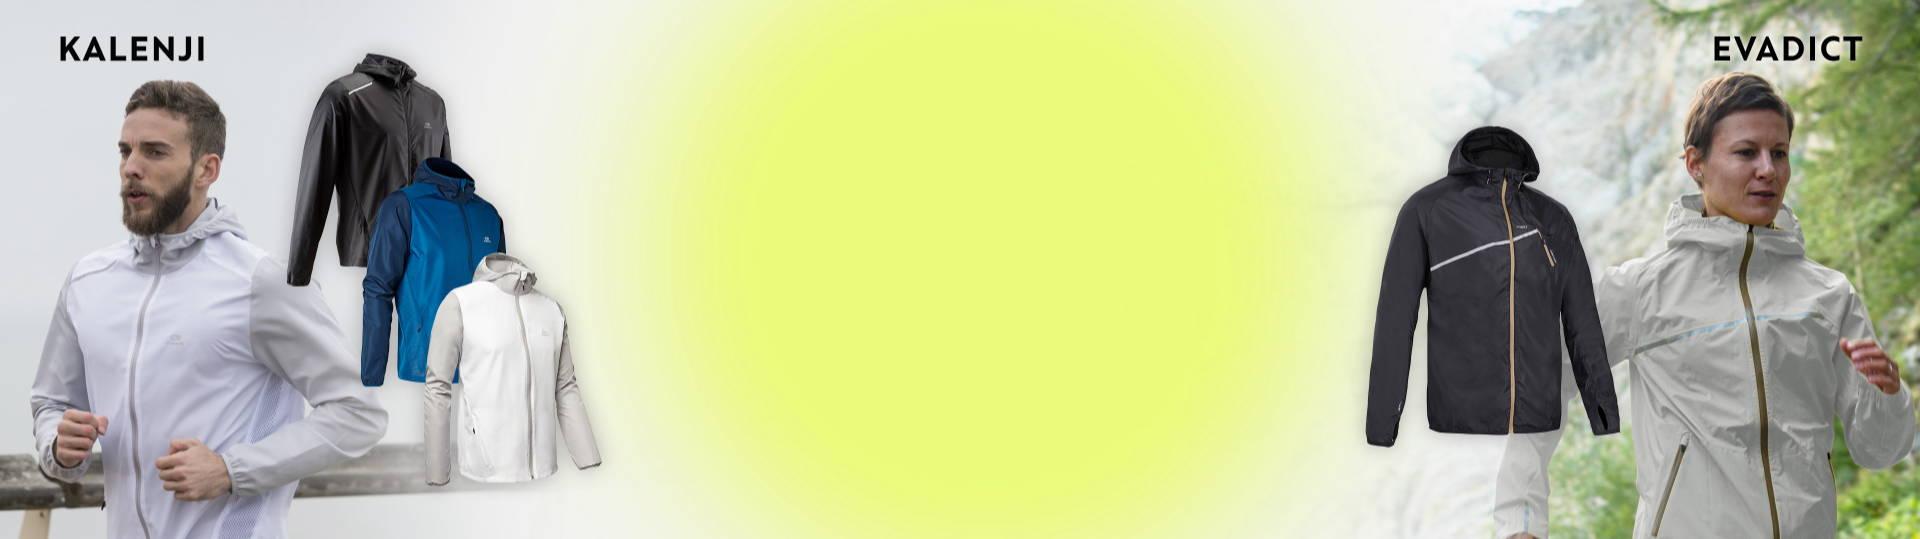 KALENJI(カレンジ)EVADICT(エバディクト)ウィンド ブレーカー  WIND BREAKER